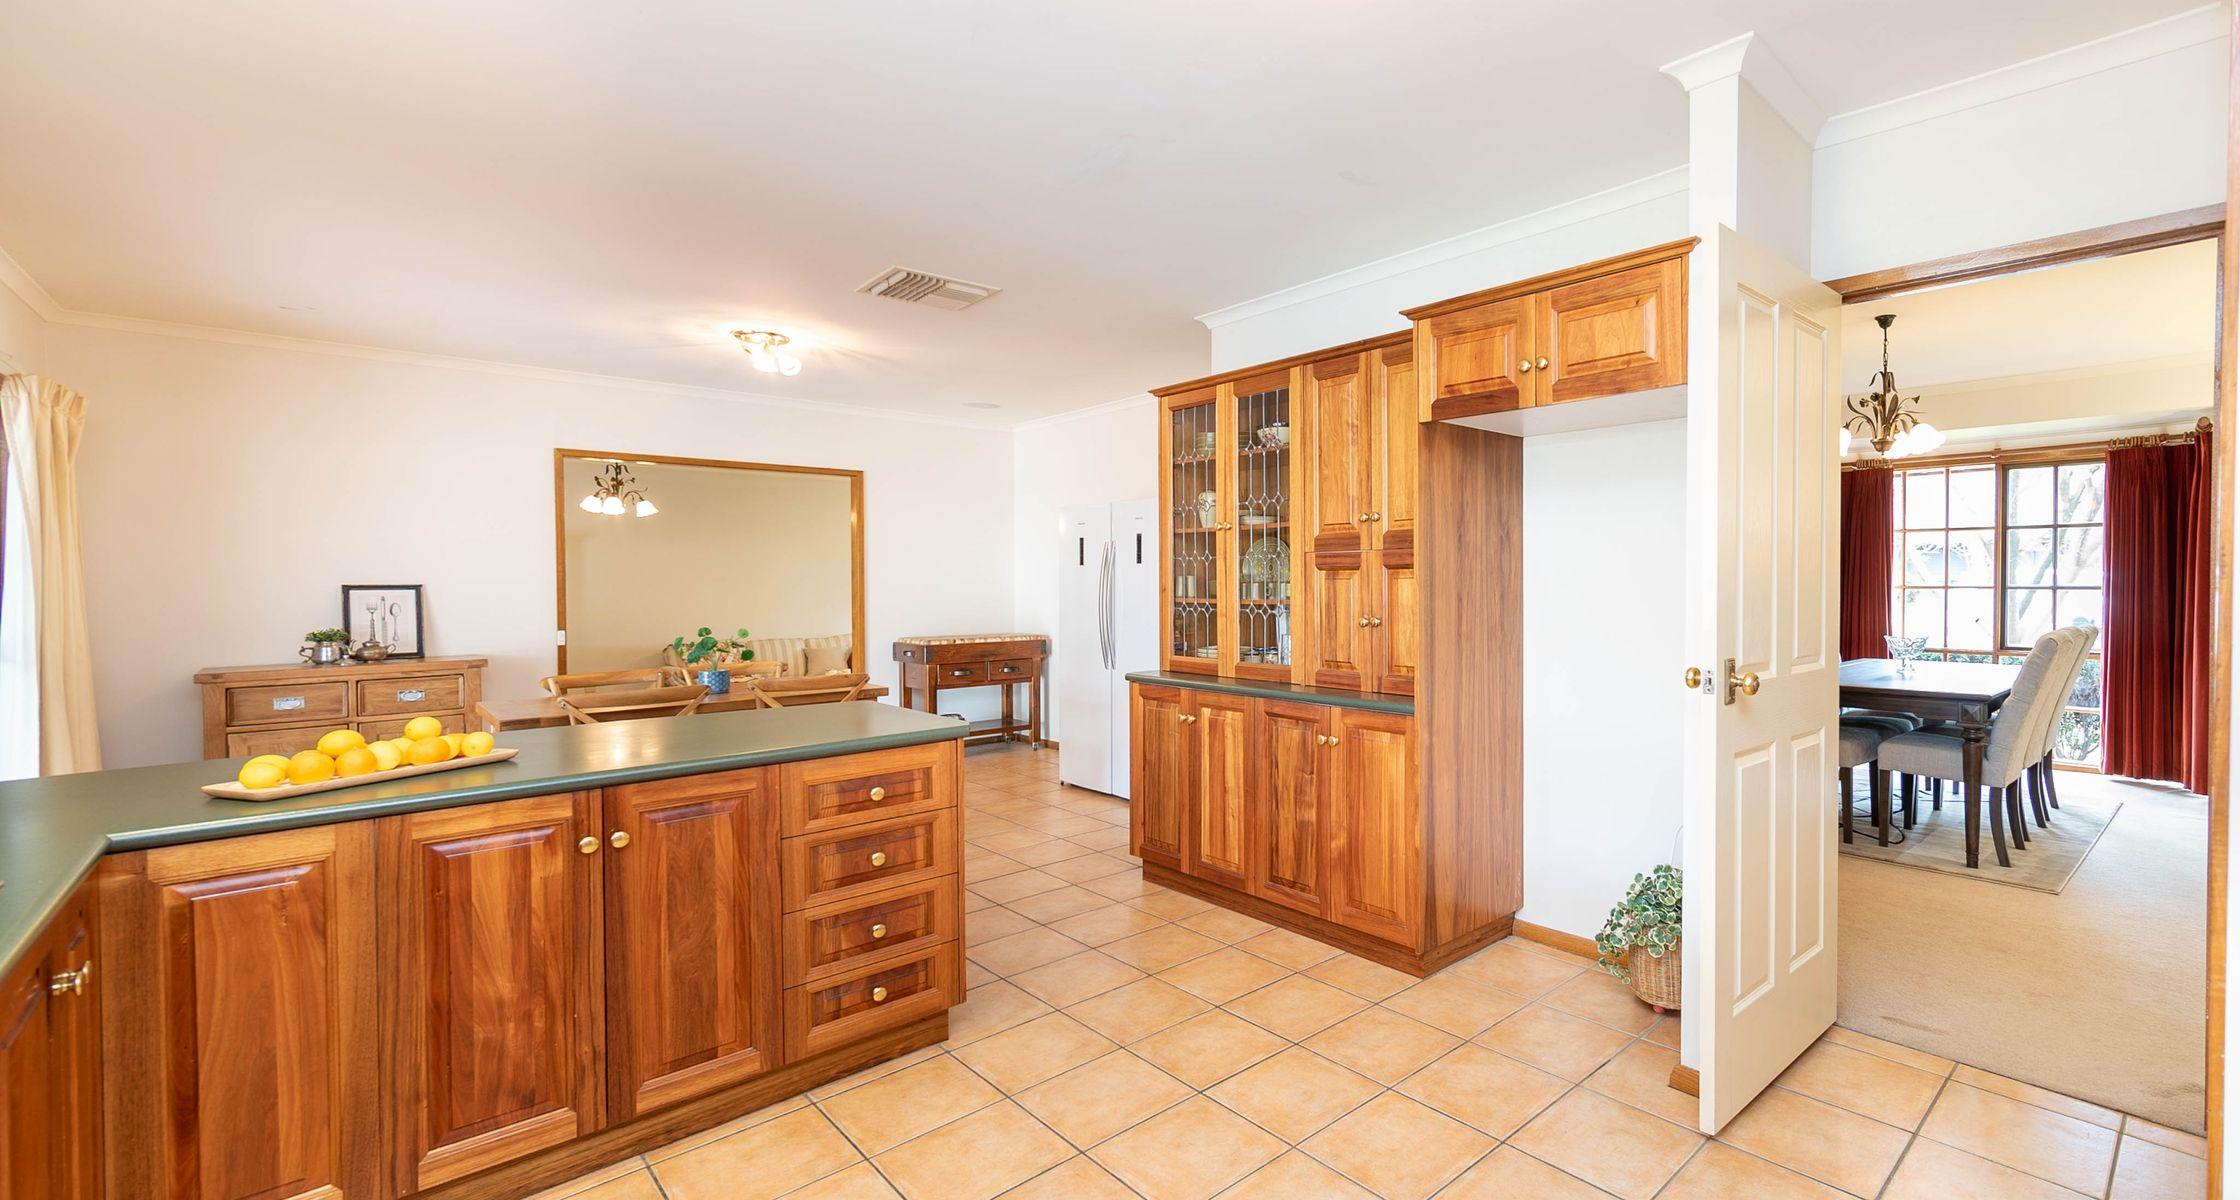 1a Walnut Court, Mildura, VIC 3500